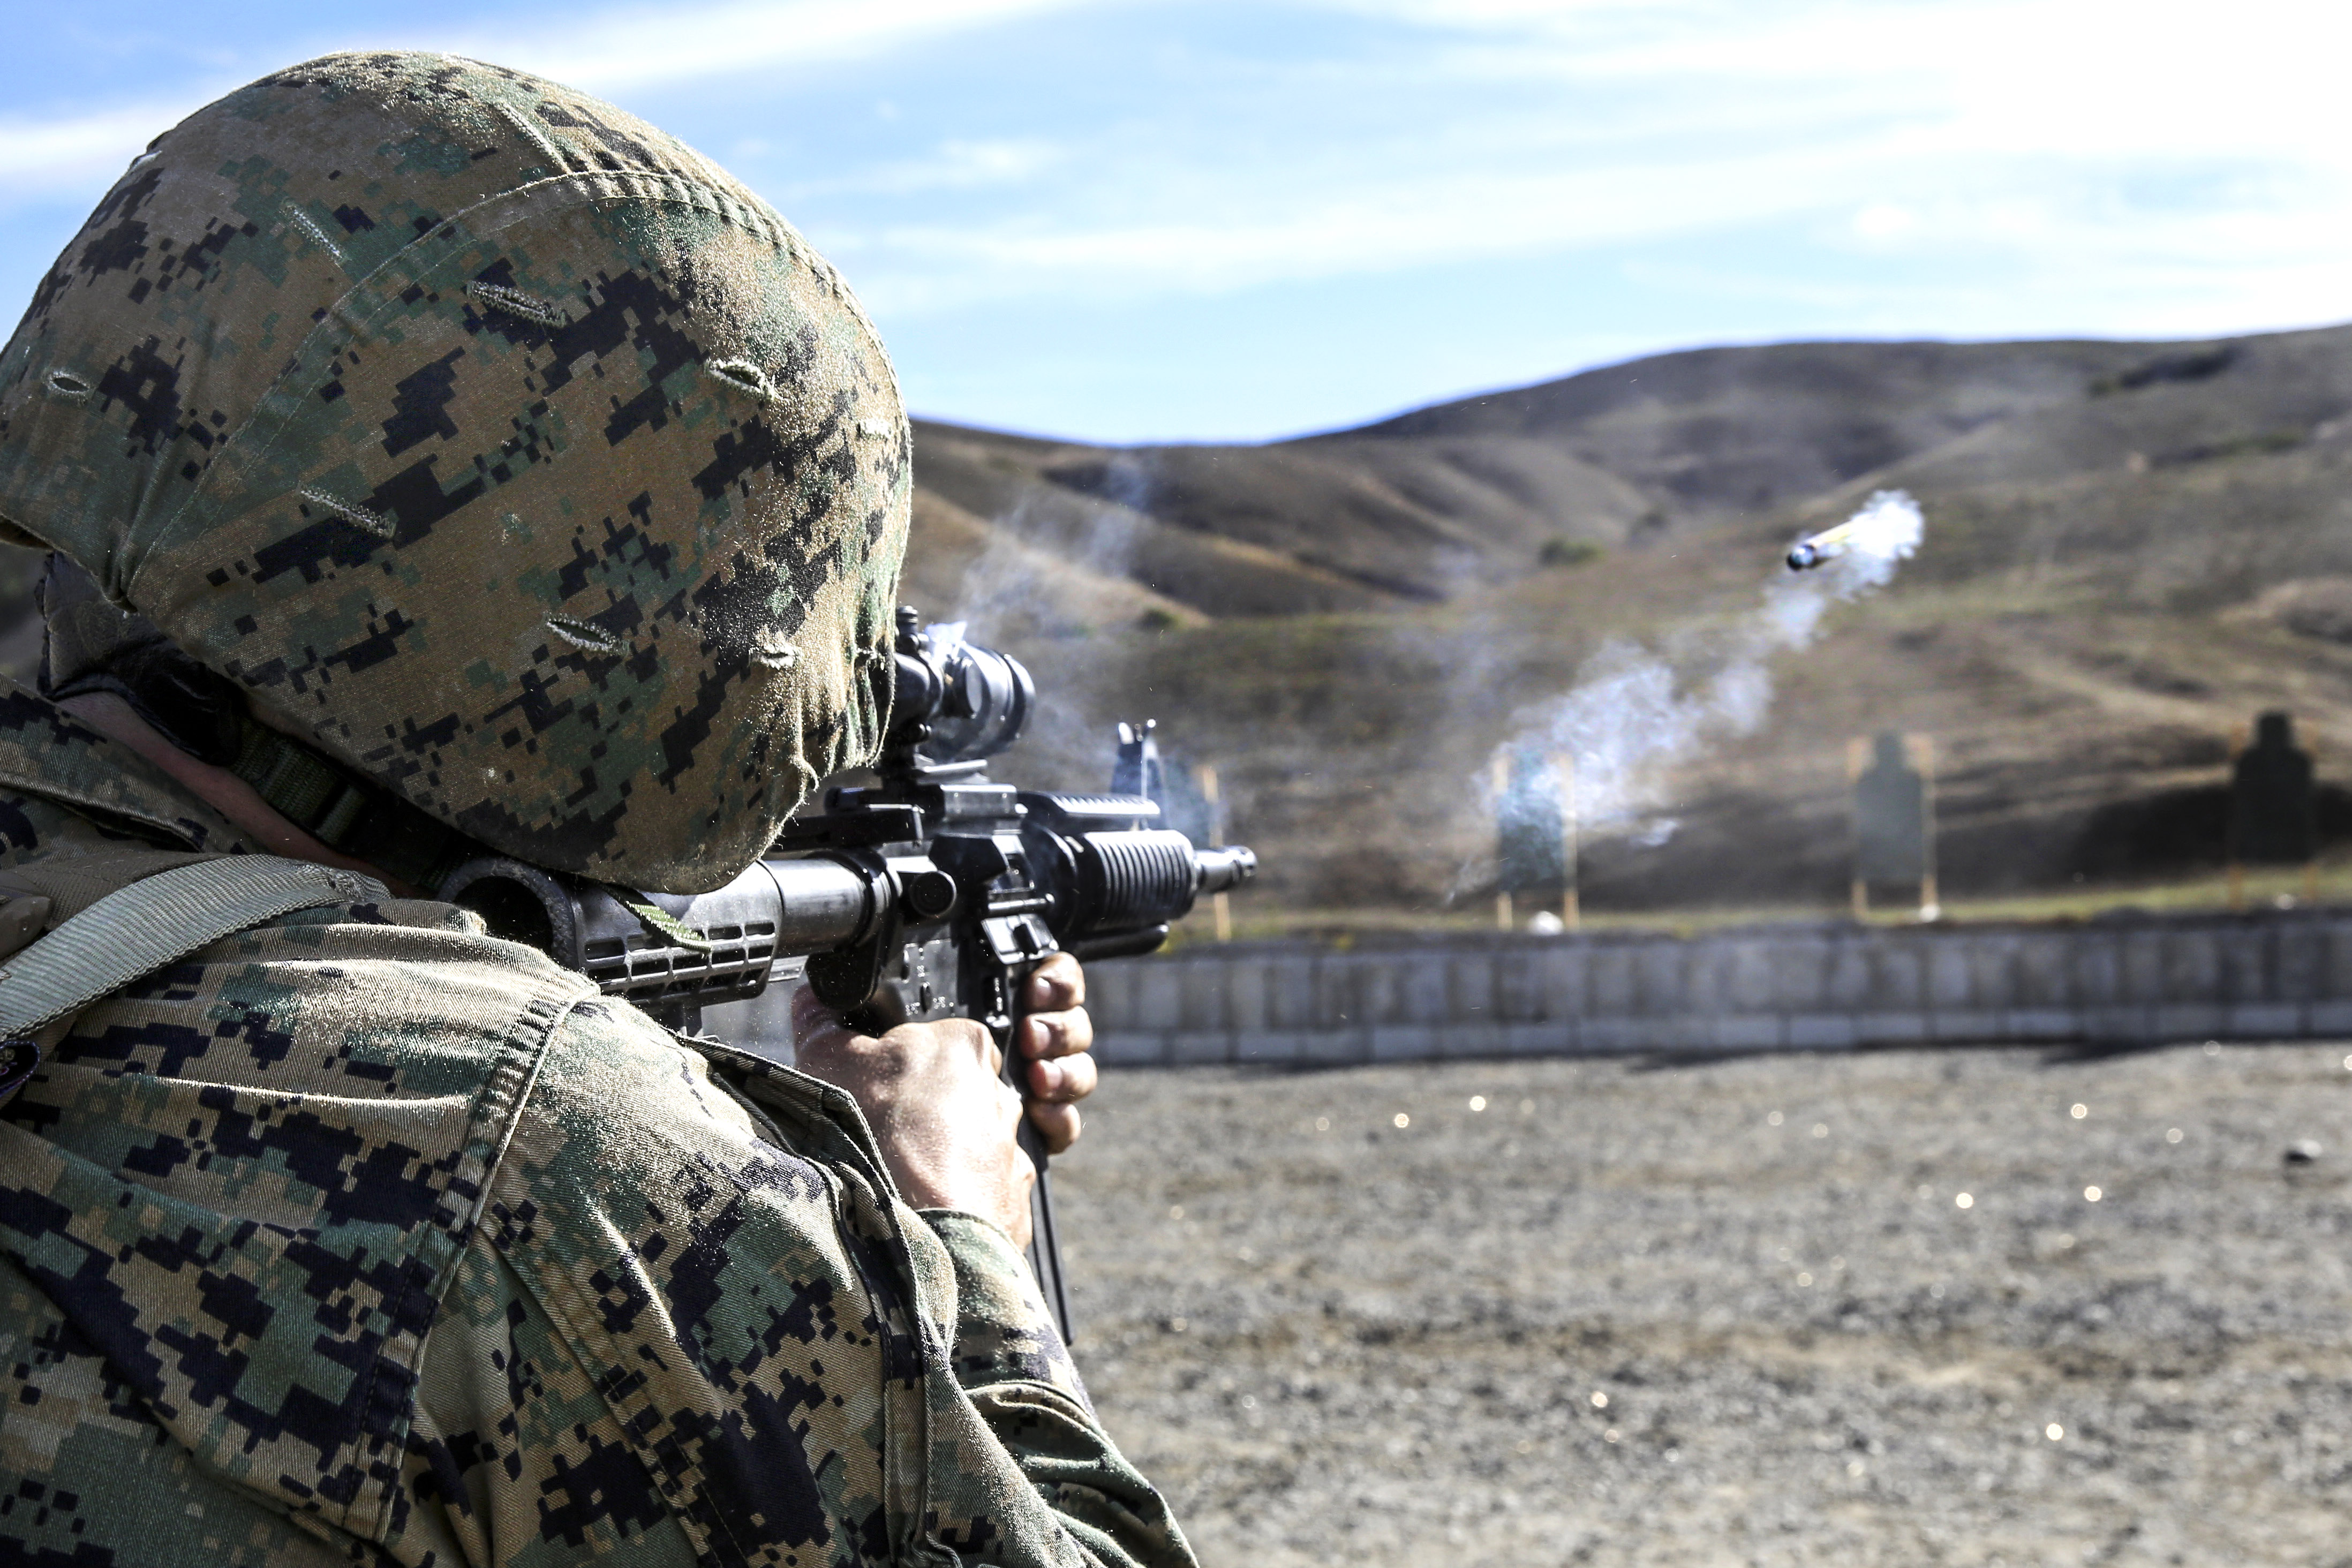 bruce dawes weapons training